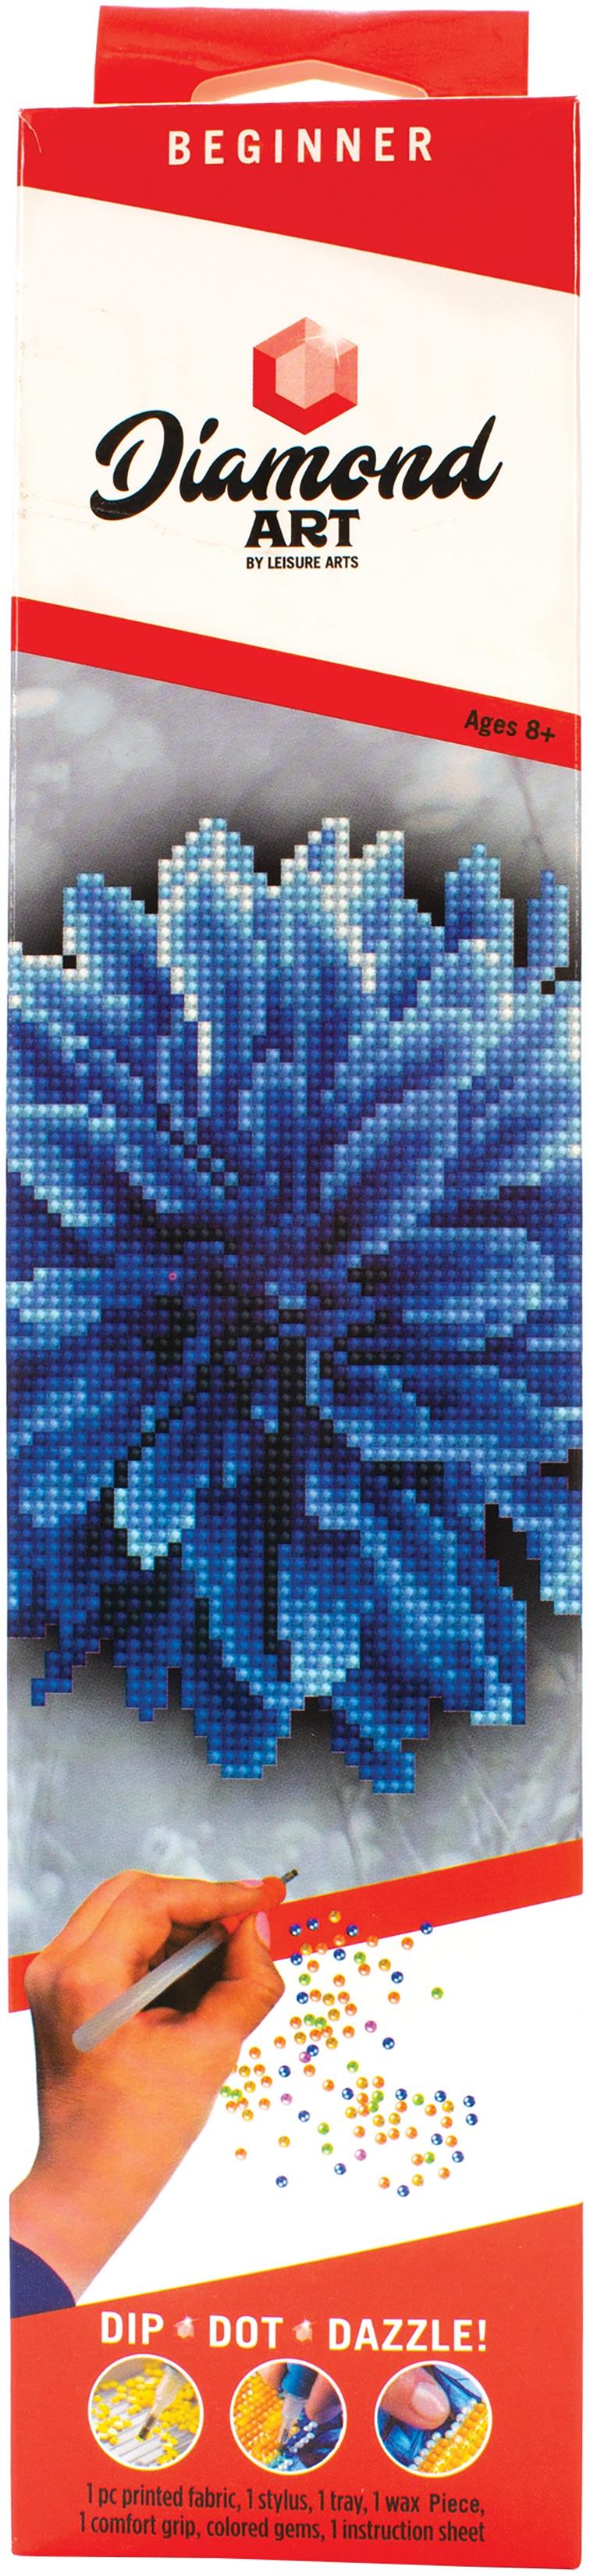 Diamond Art Kit 8x8 Beginner Blue Dahlia